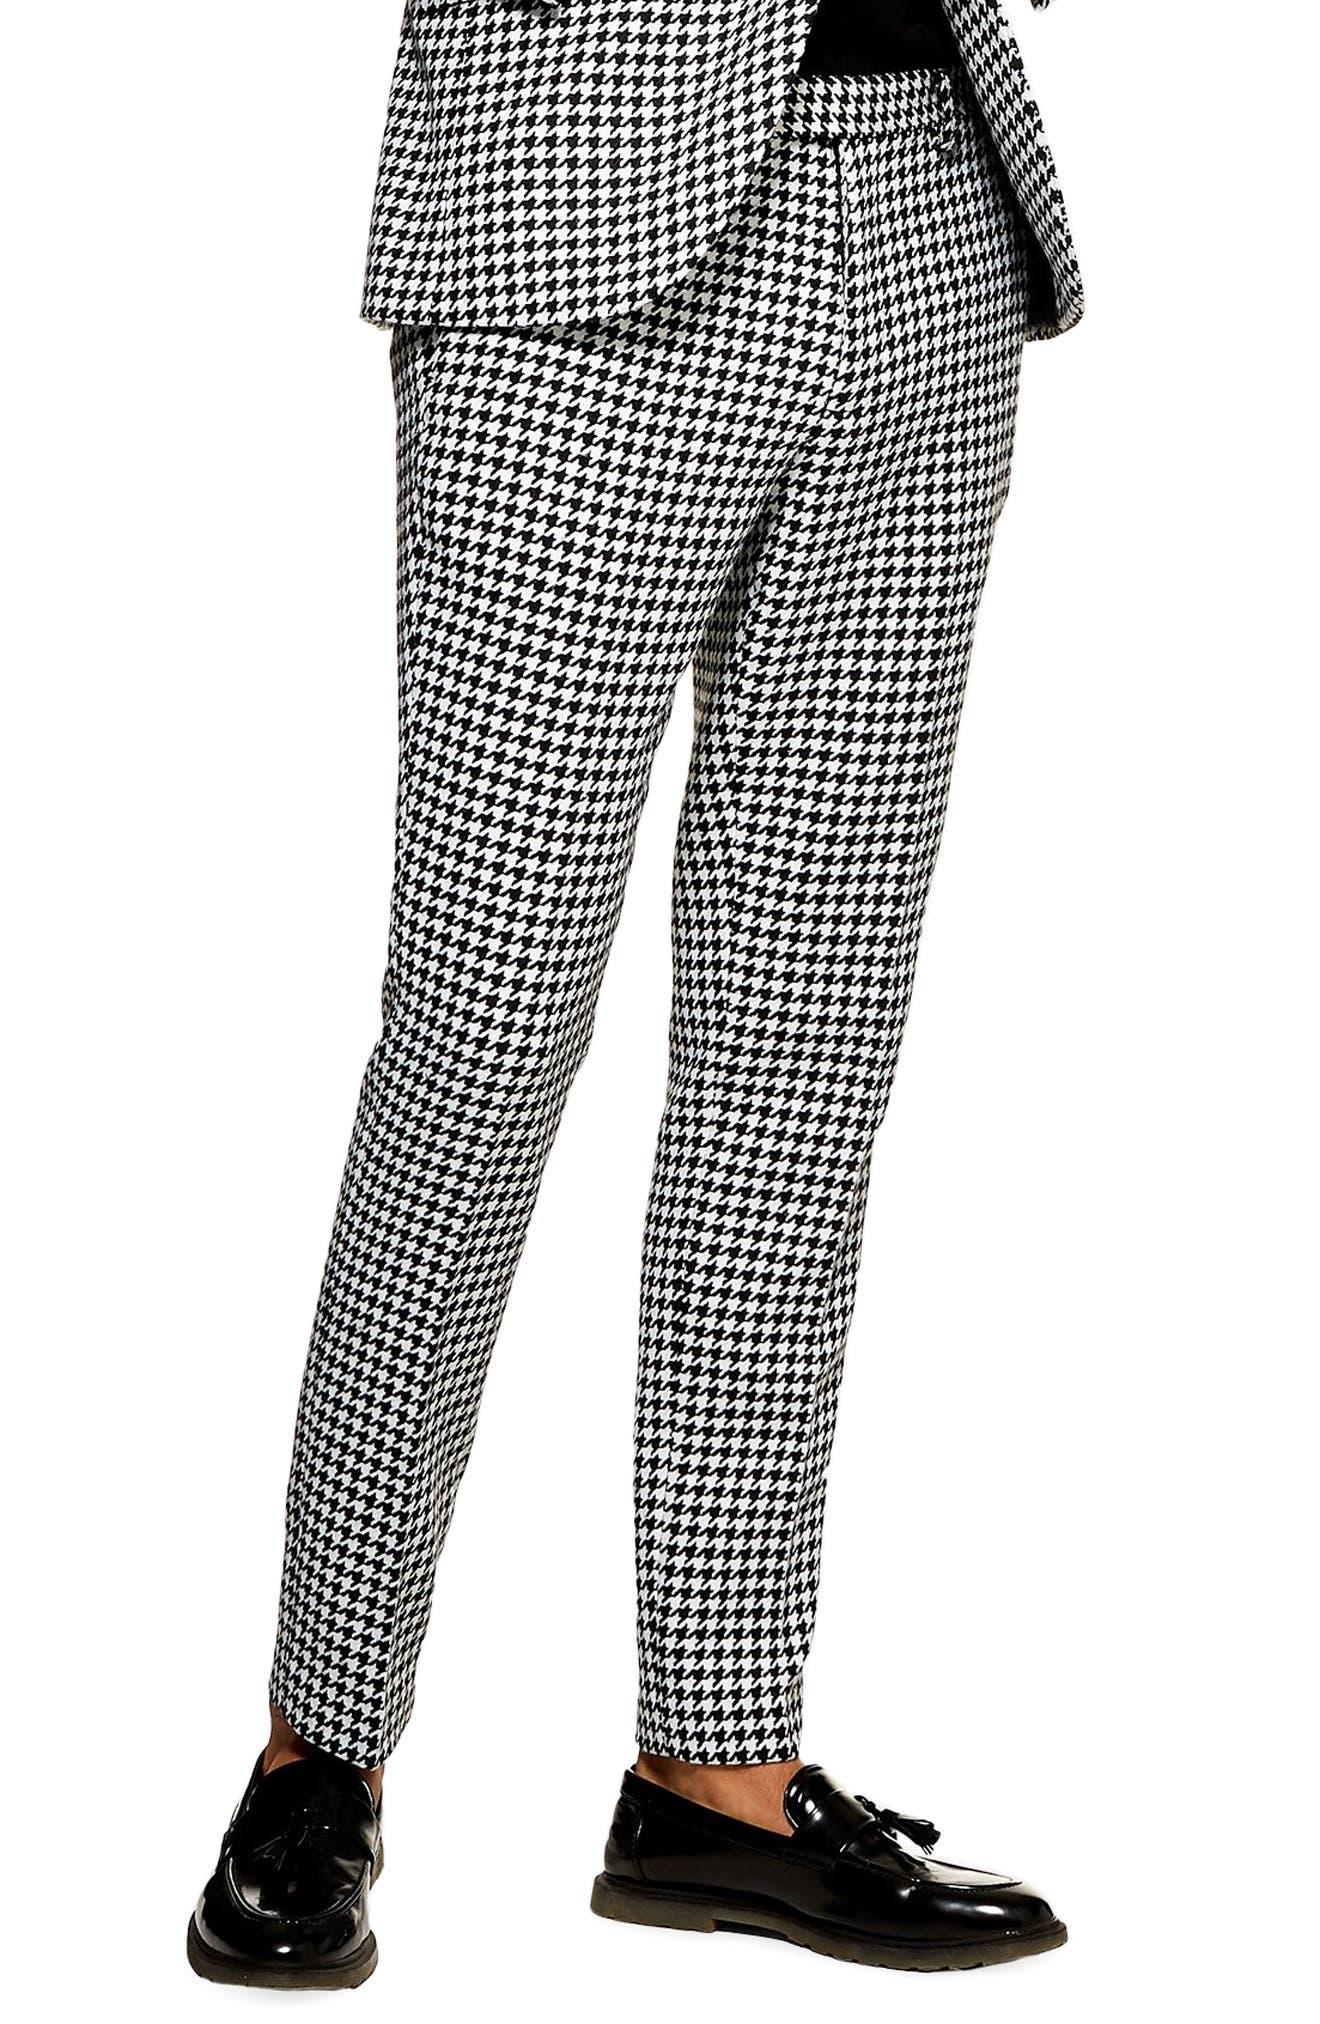 TOPMAN Roe Skinny Fit Trousers, Main, color, 001